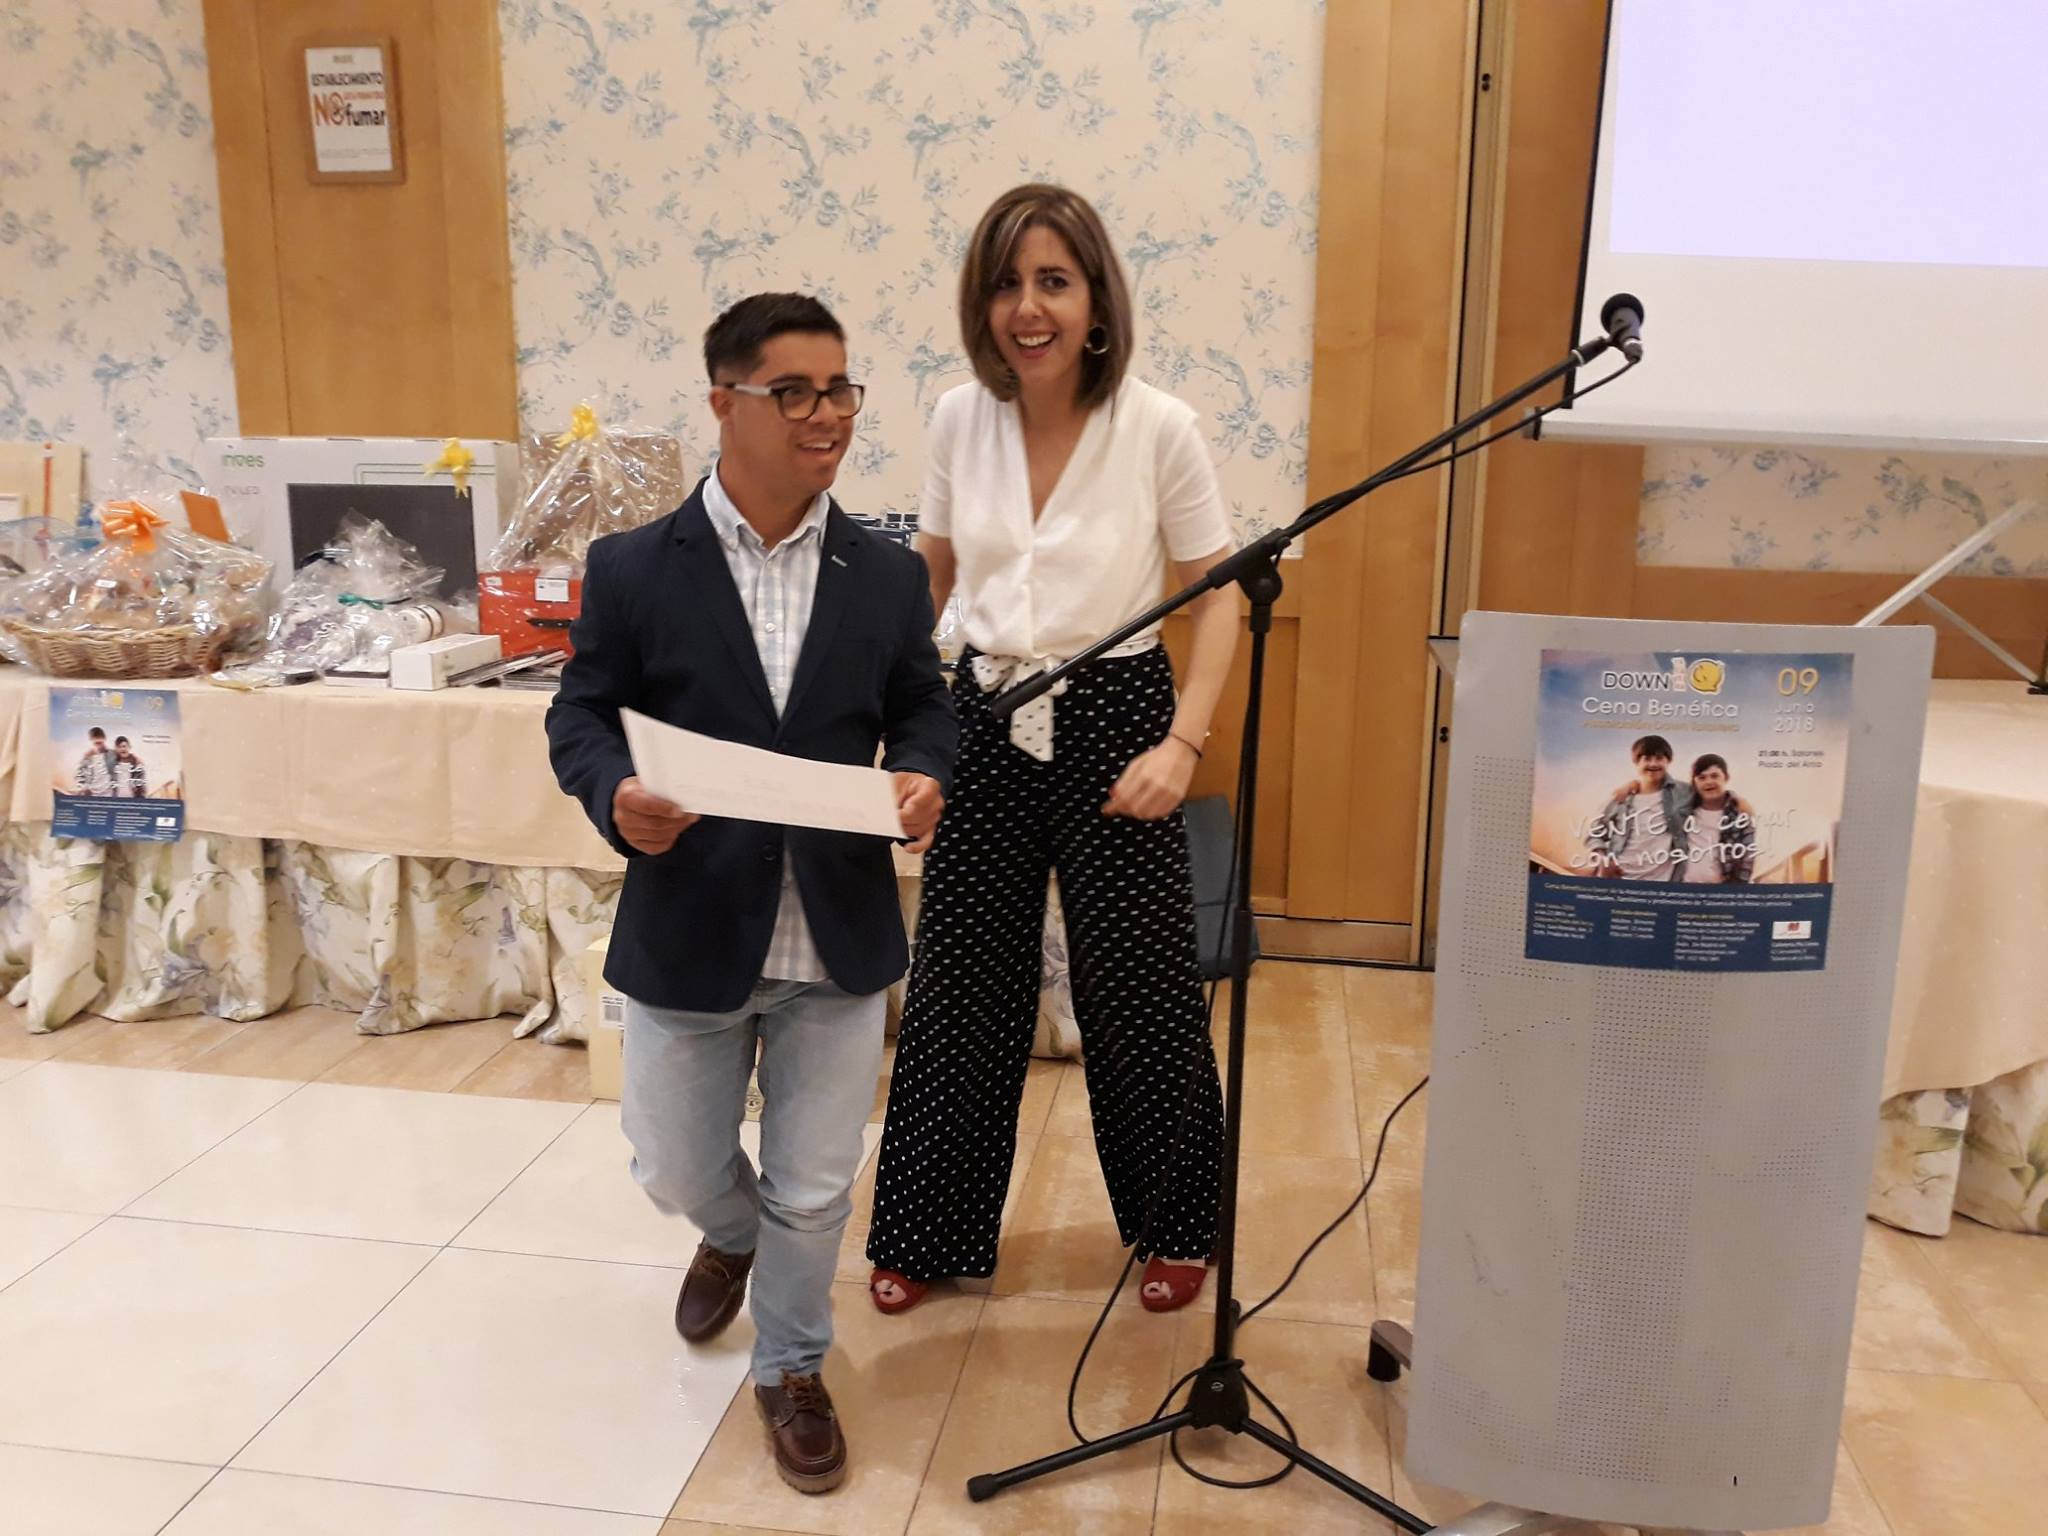 Cena Down Talavera 2018